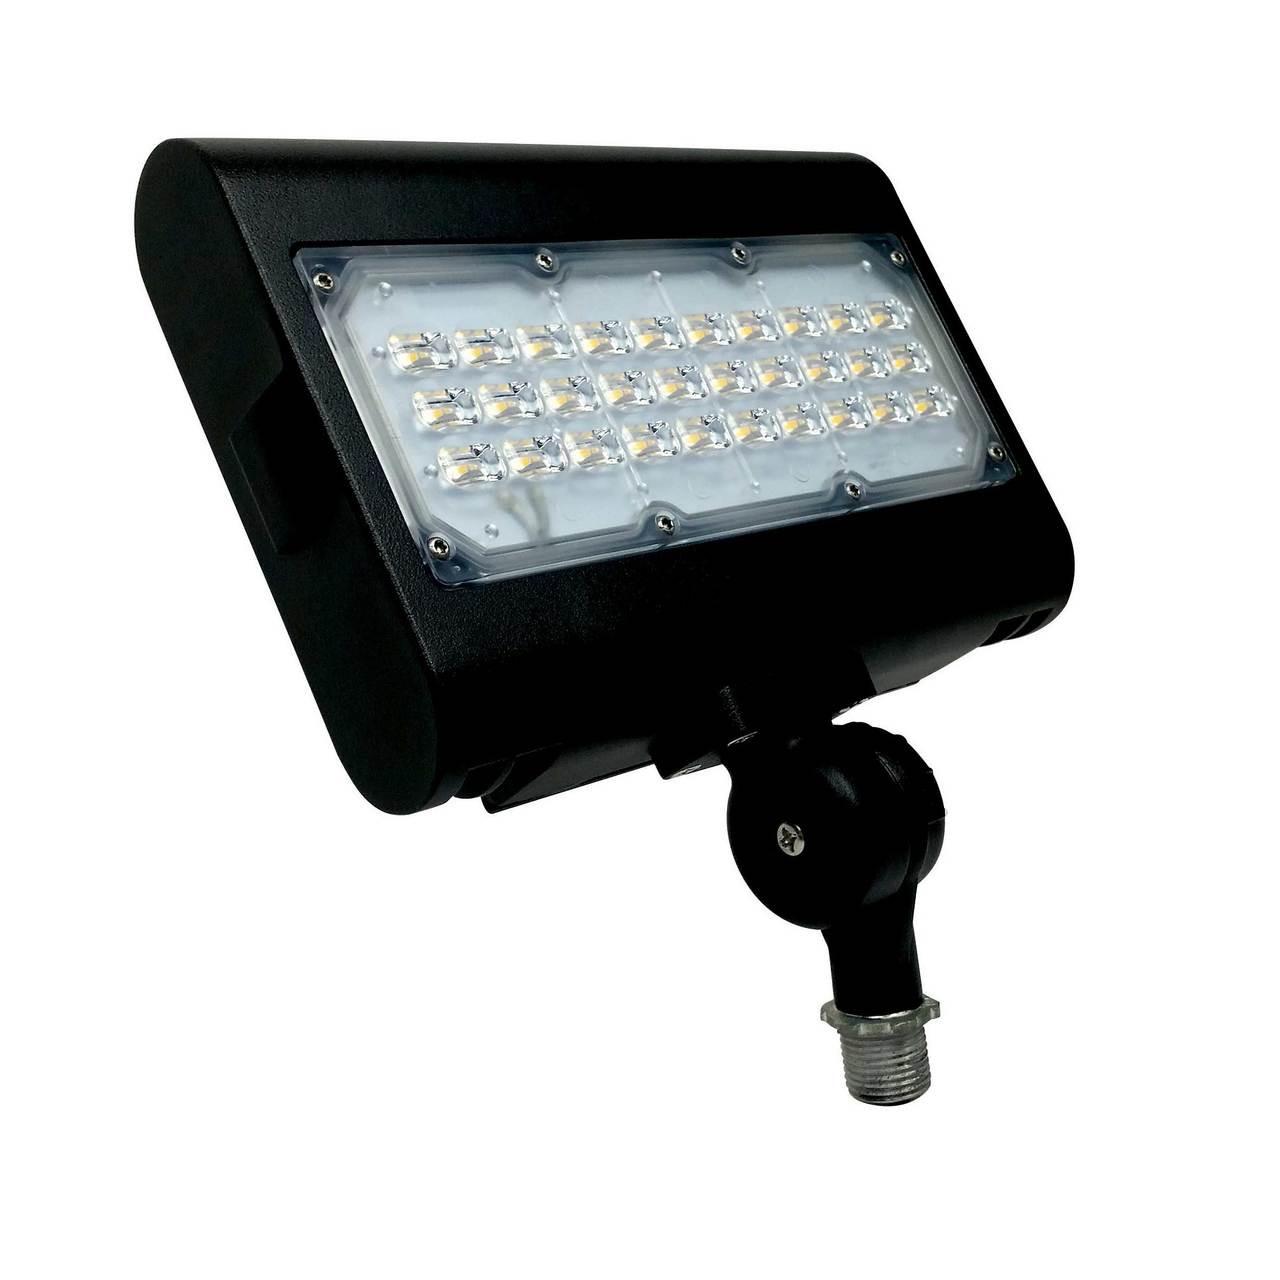 rab design led flood light 50w yoke mount